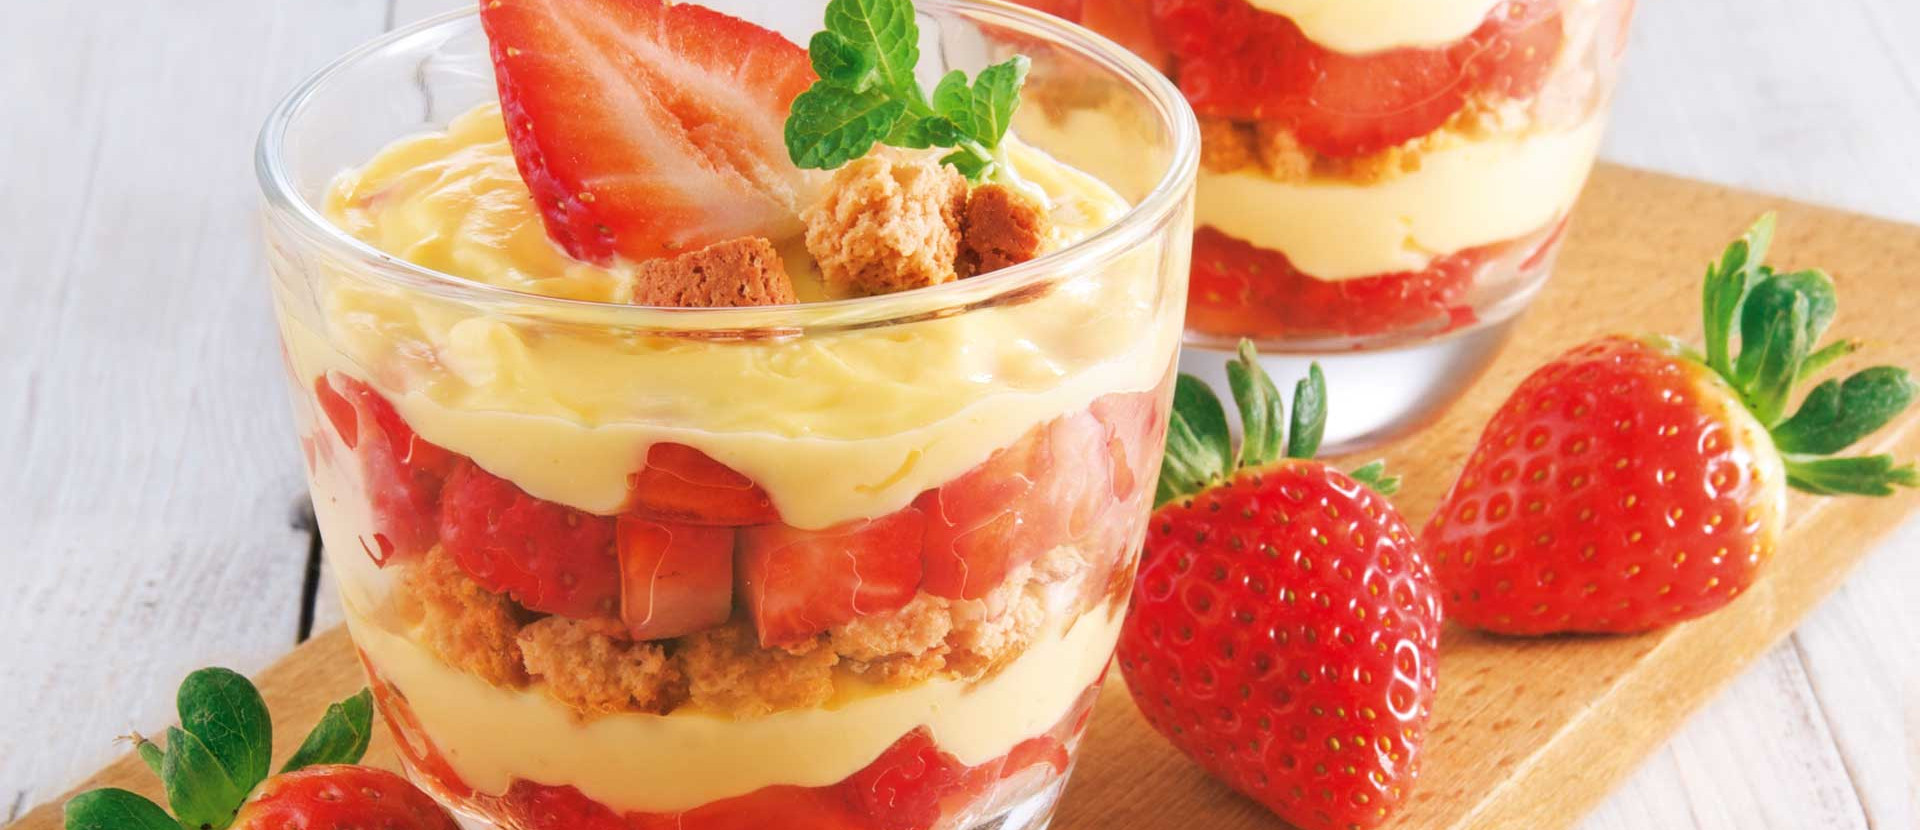 Erdbeer Schichtcreme Eierlikoer Cantuccini